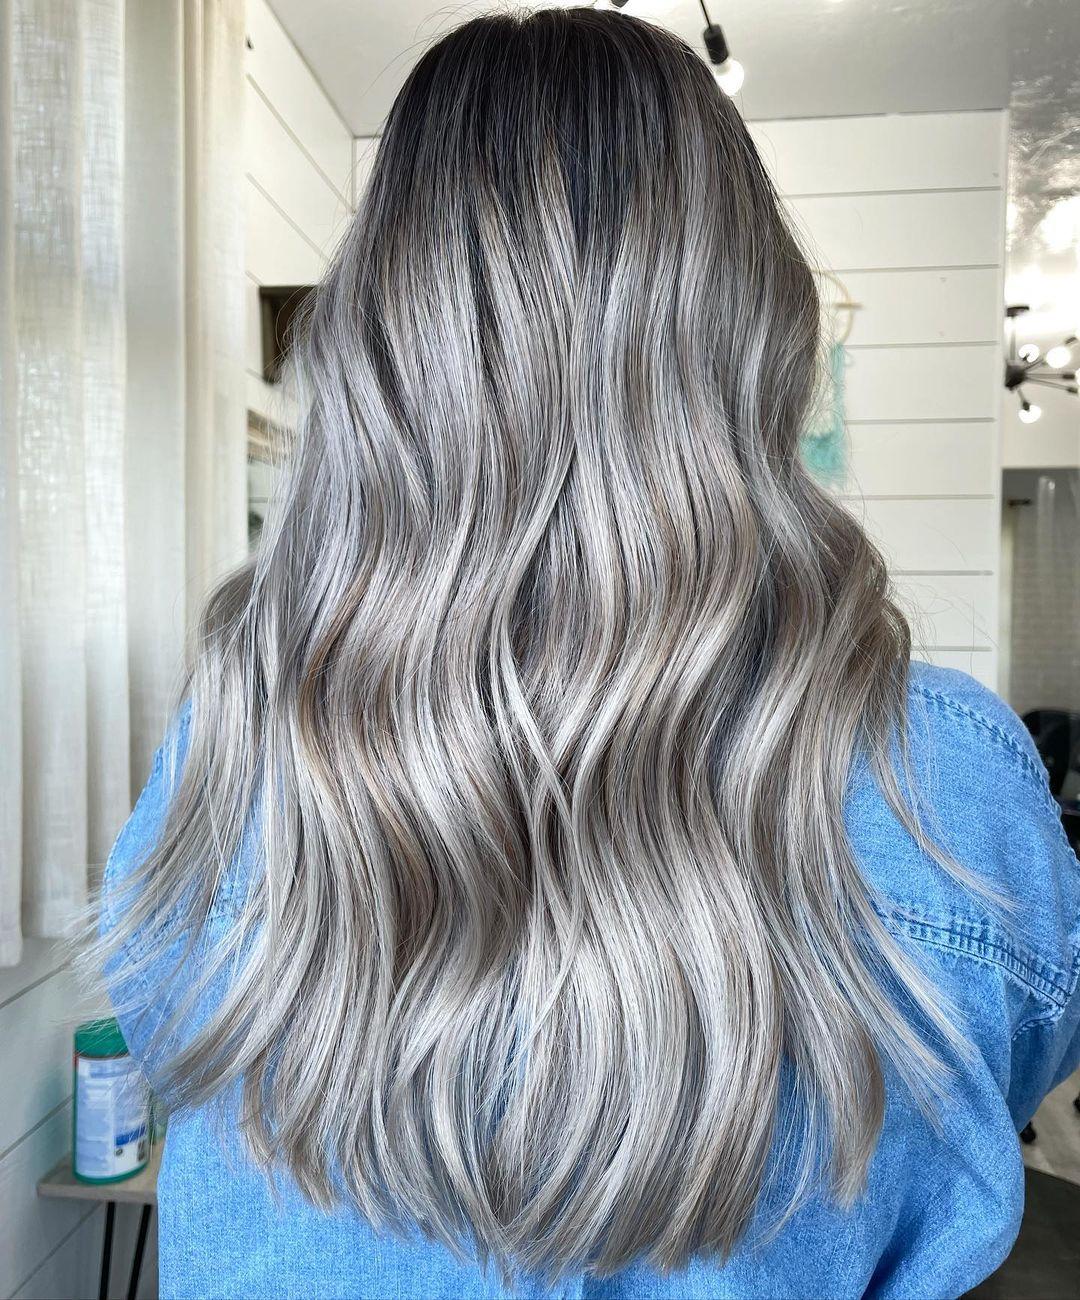 Dark Silver Hair with Brown Lowlights